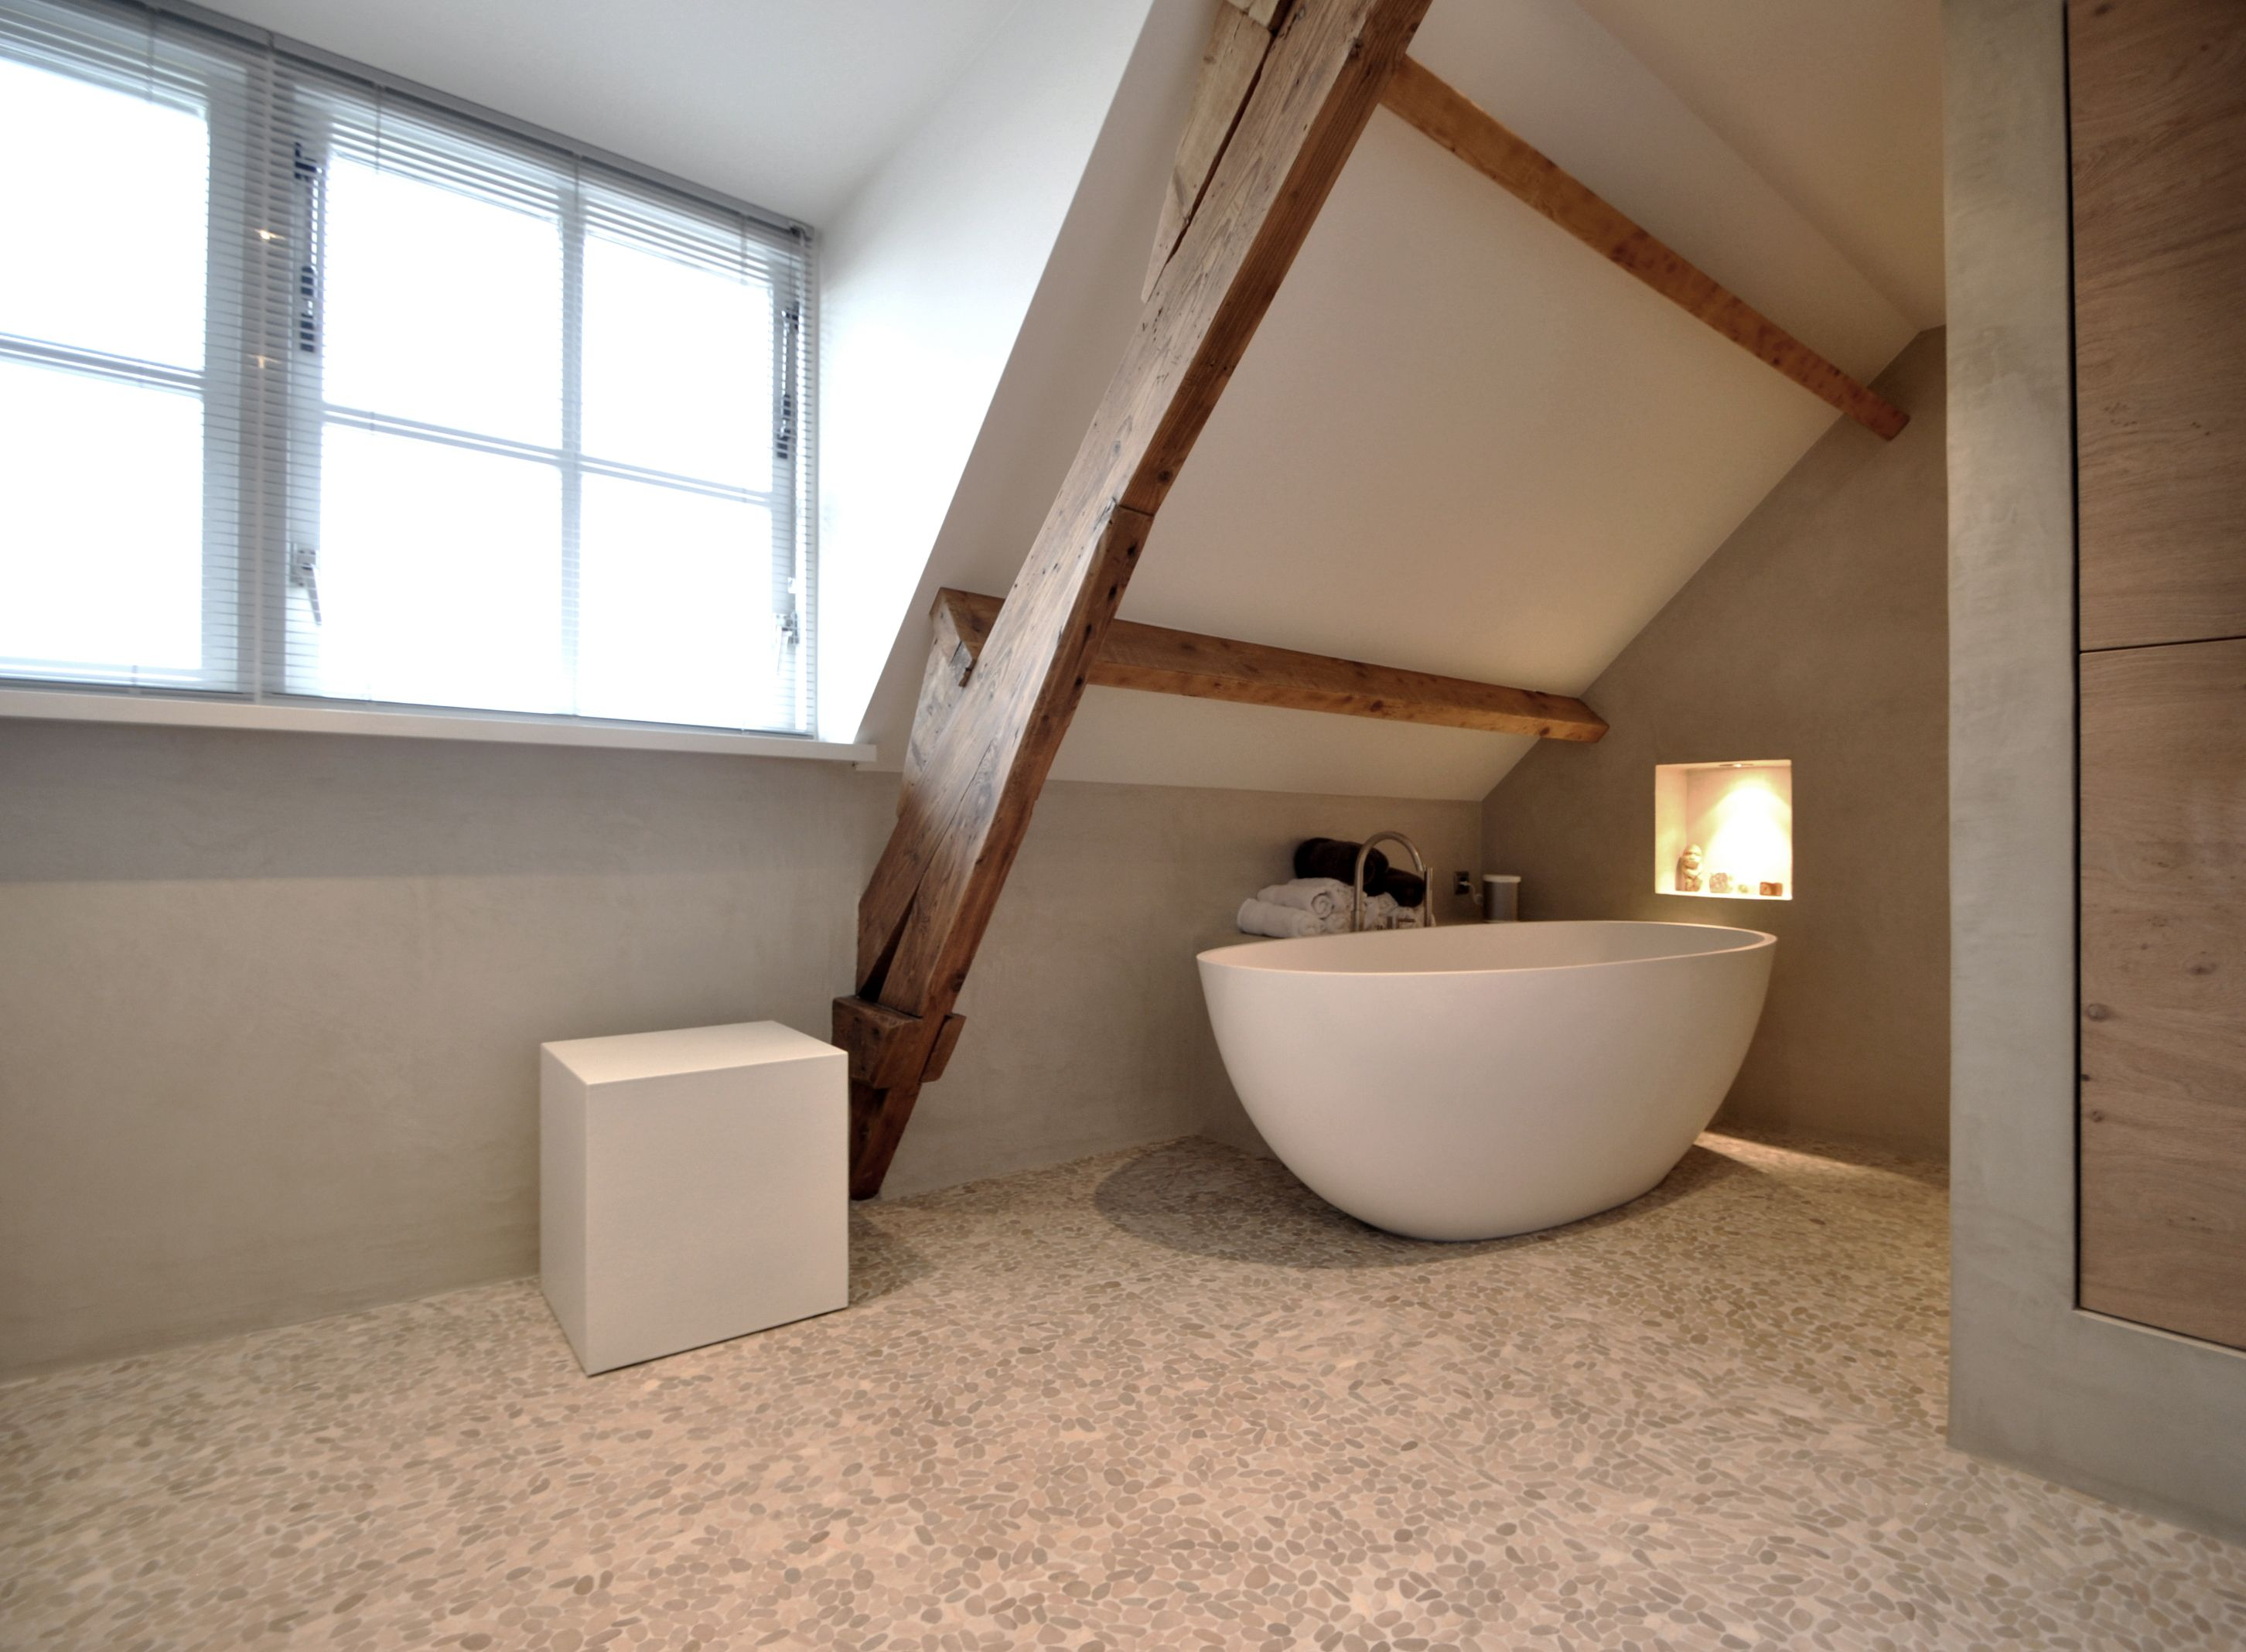 Betonstuc Badkamer Kosten : Sober en stoer betonstuc van herijgers badkamers herijgers